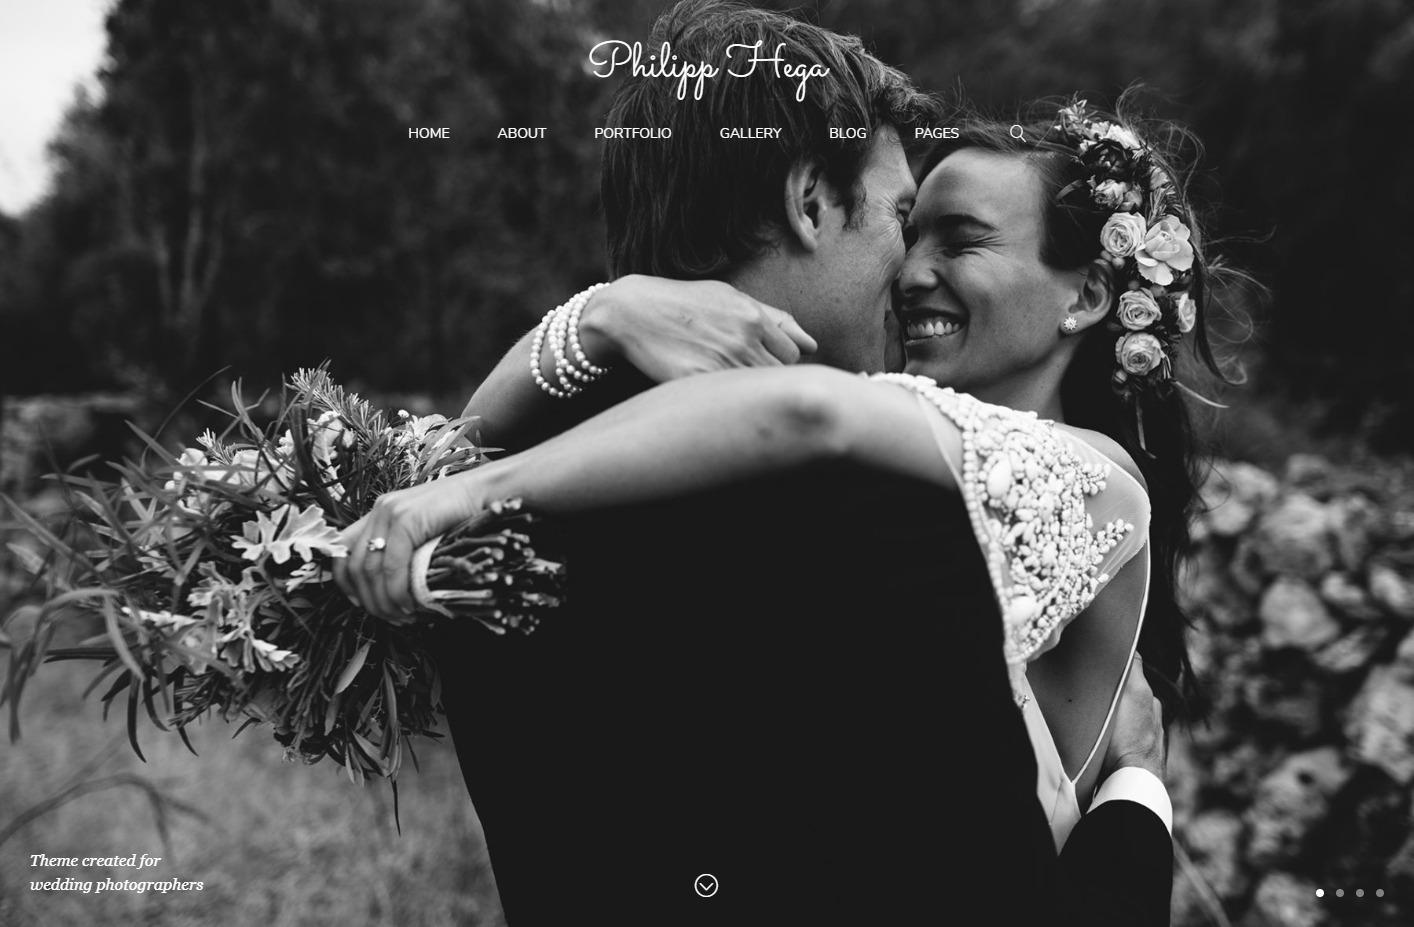 PH Responsive Theme for Wedding Photo Websites